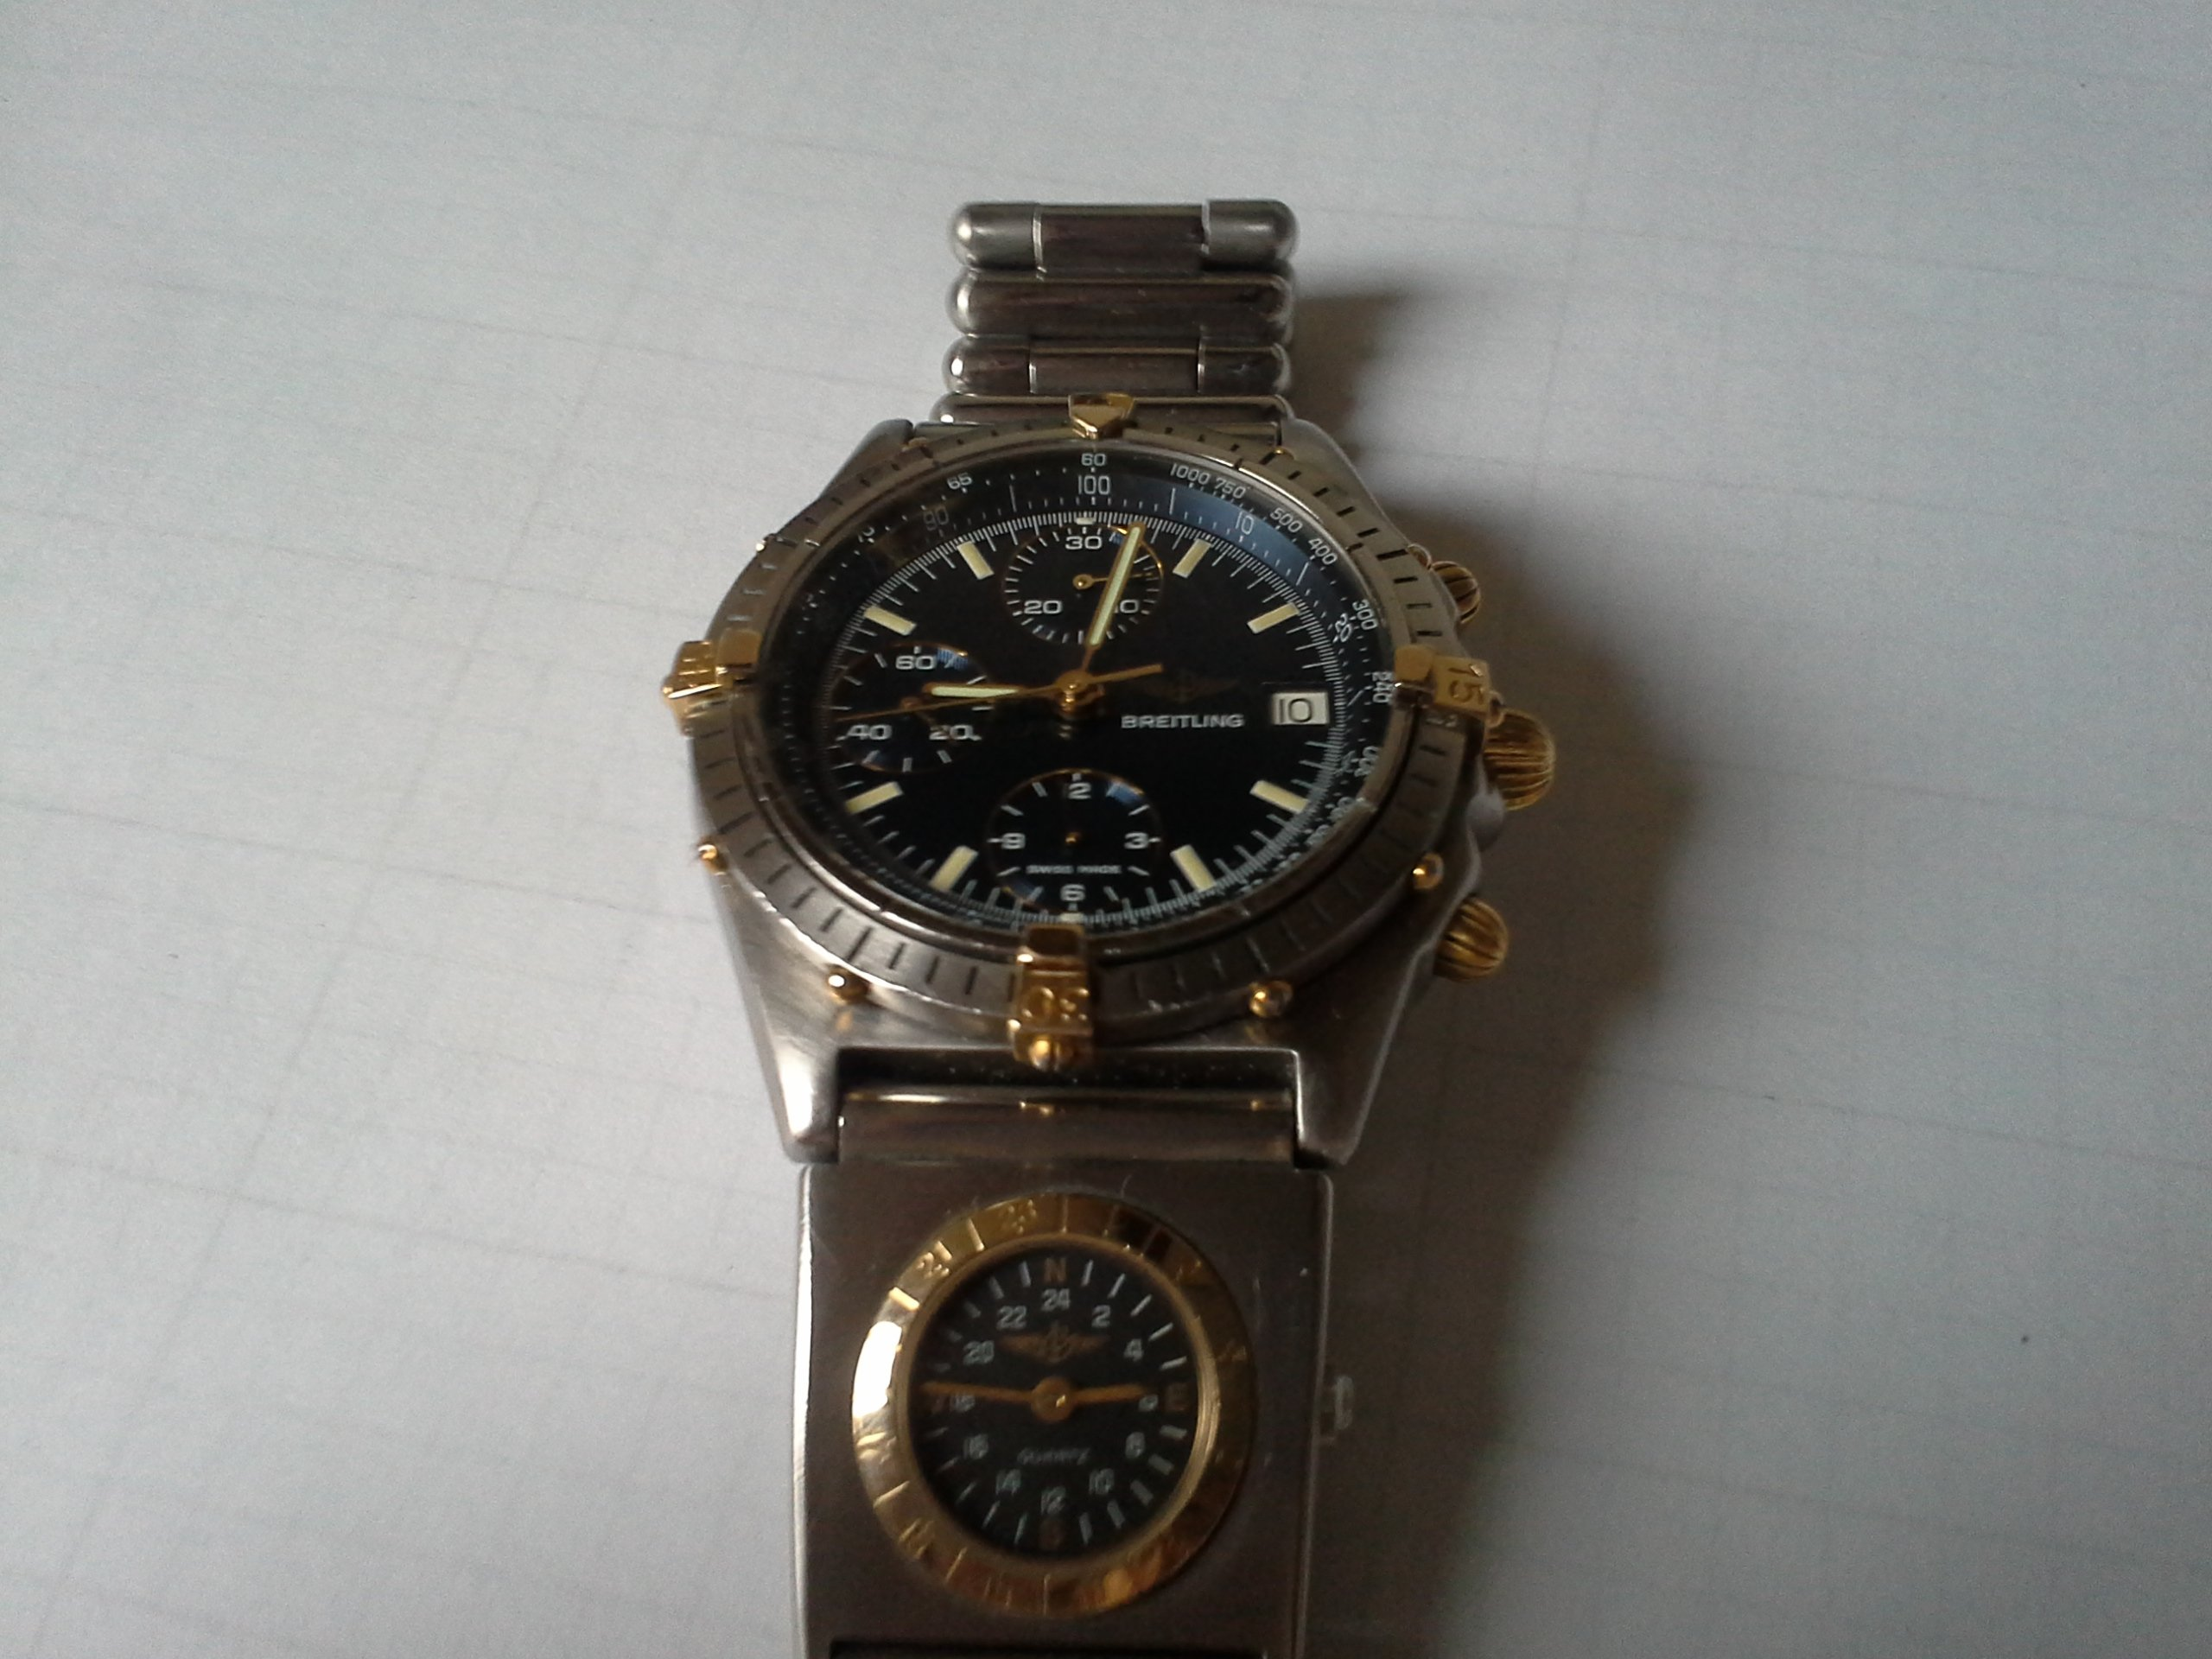 Breitling Chronomat 81.950 Utc